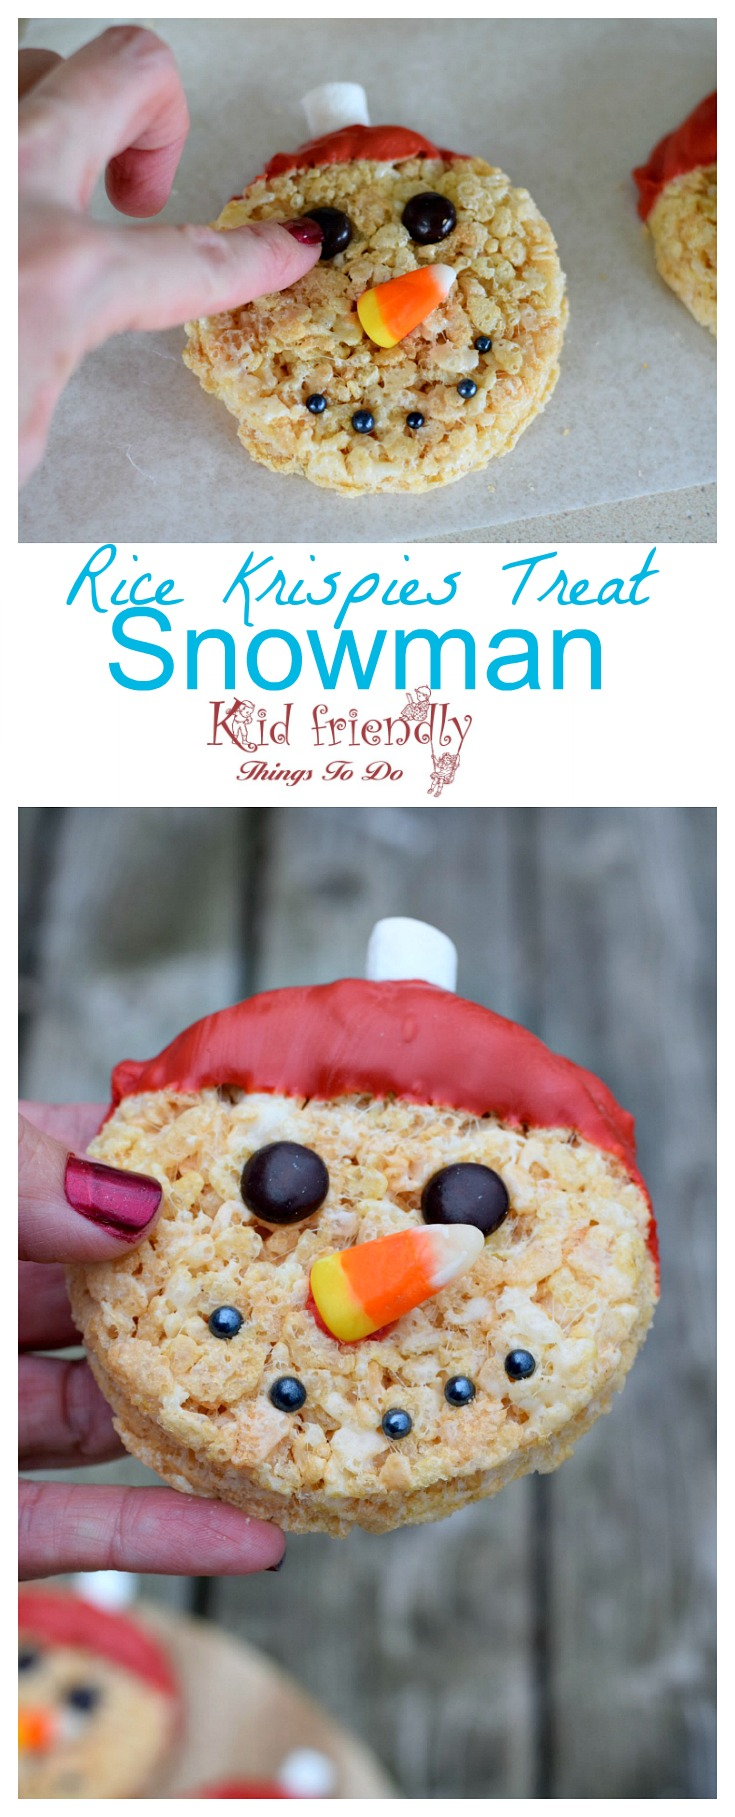 Snowman Rice Krispies Treat for a fun winter or Christmas treat. www.kidfriendlythingstodo.com